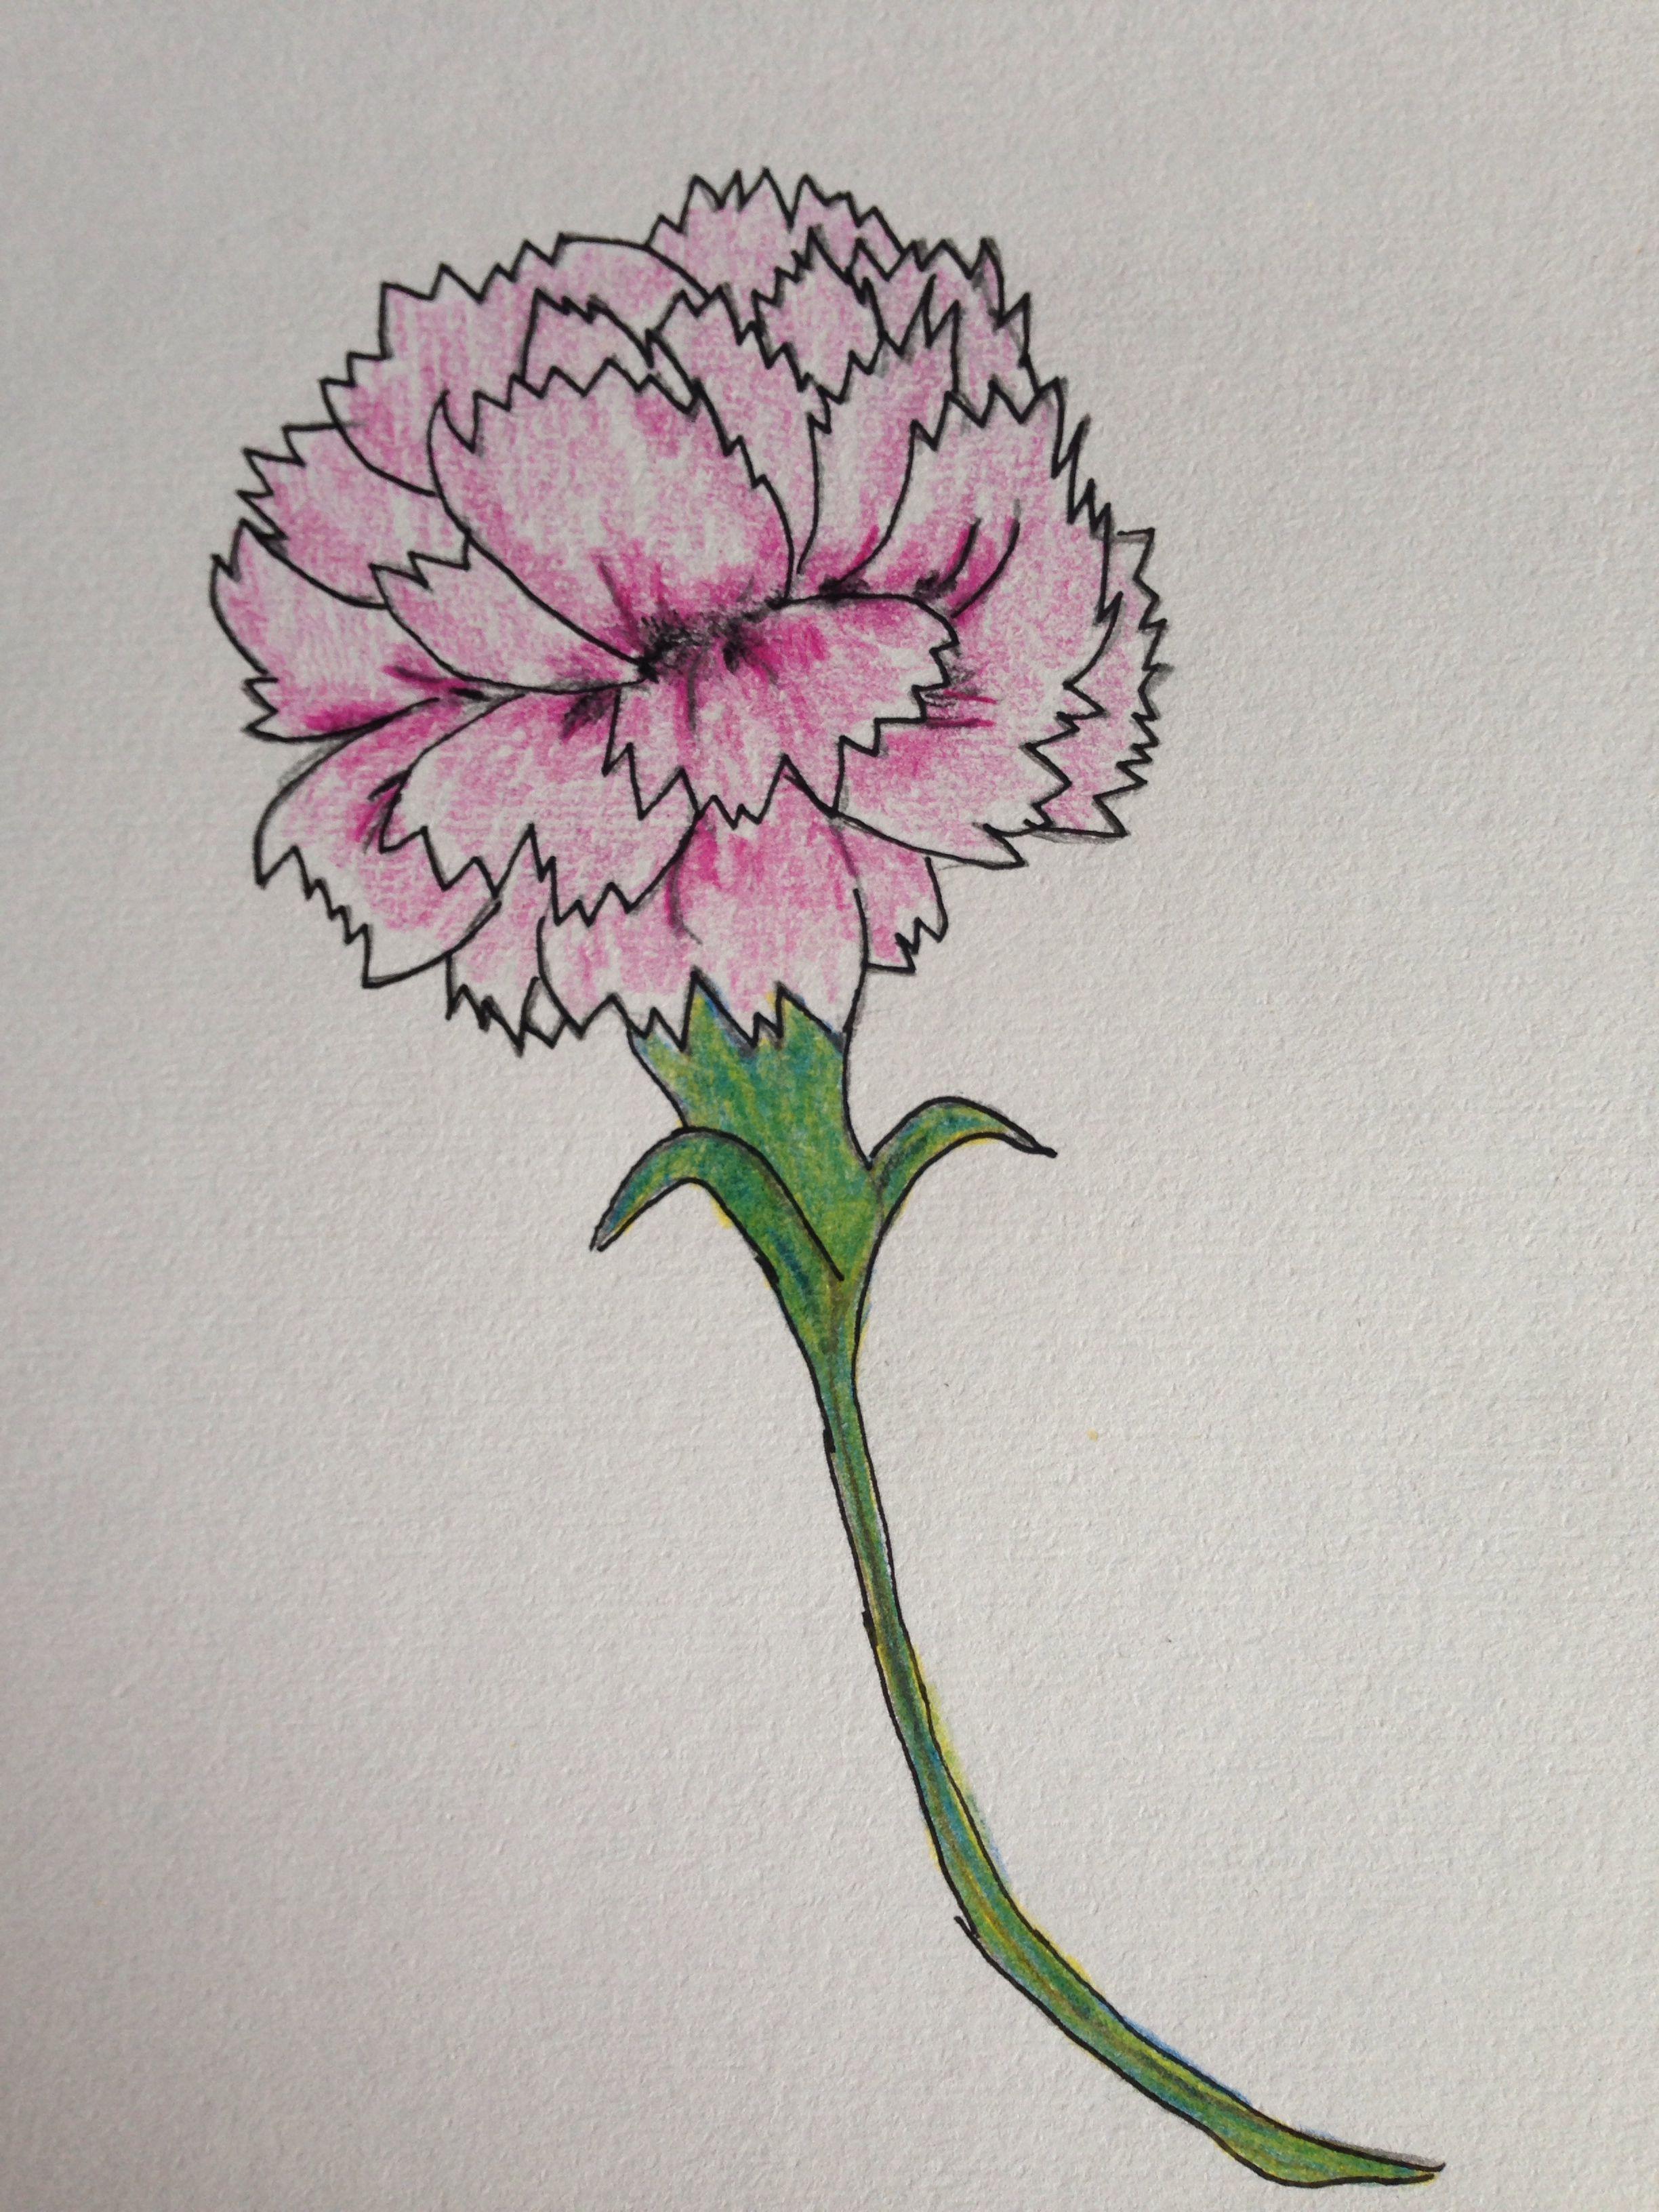 My Carnation - 8/31/14